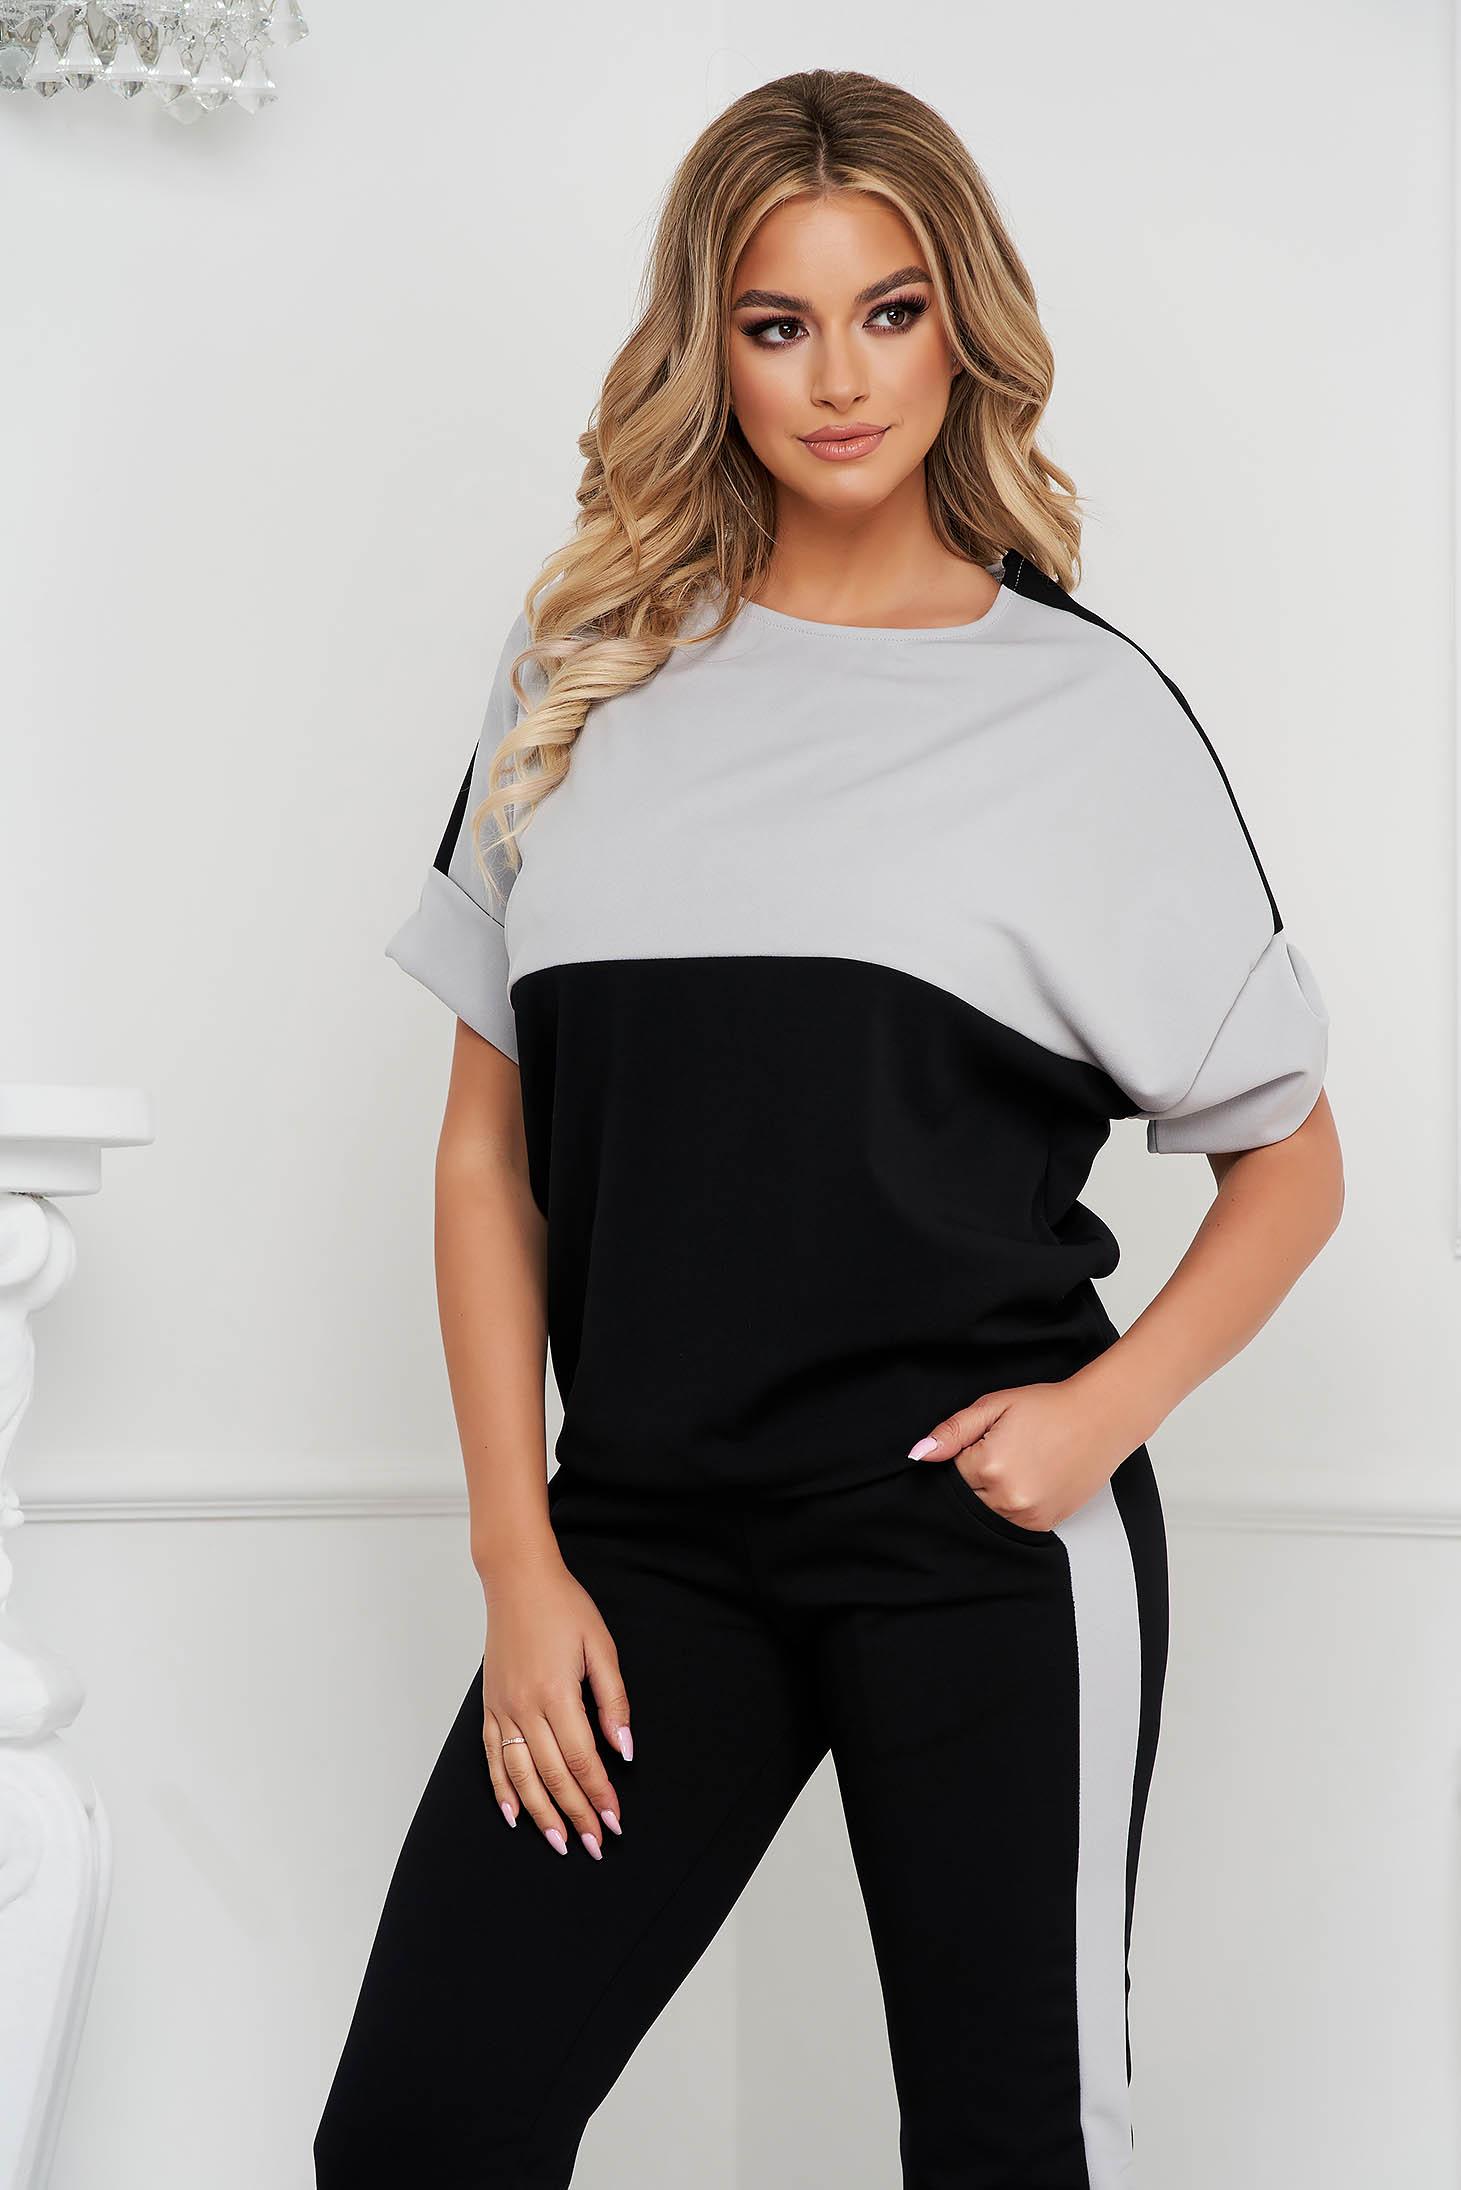 Black sport 2 pieces loose fit medium waist with pockets